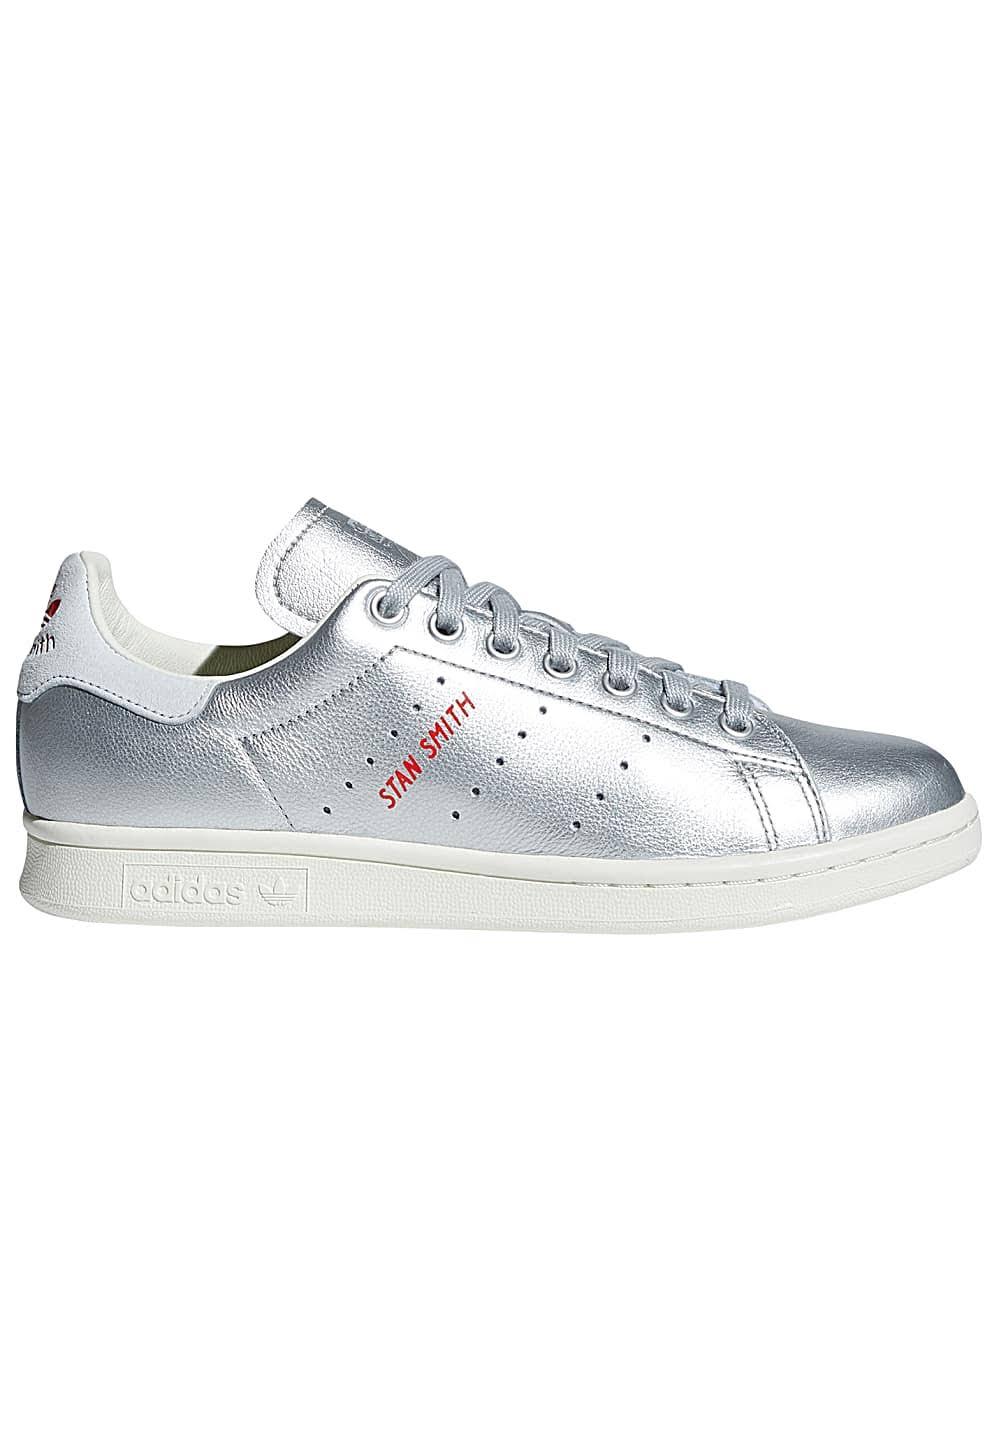 Originals Adidas Originals Adidas Smith Originals Stan Stan DamesZilver DamesZilver Smith Adidas tQCBsdxrh